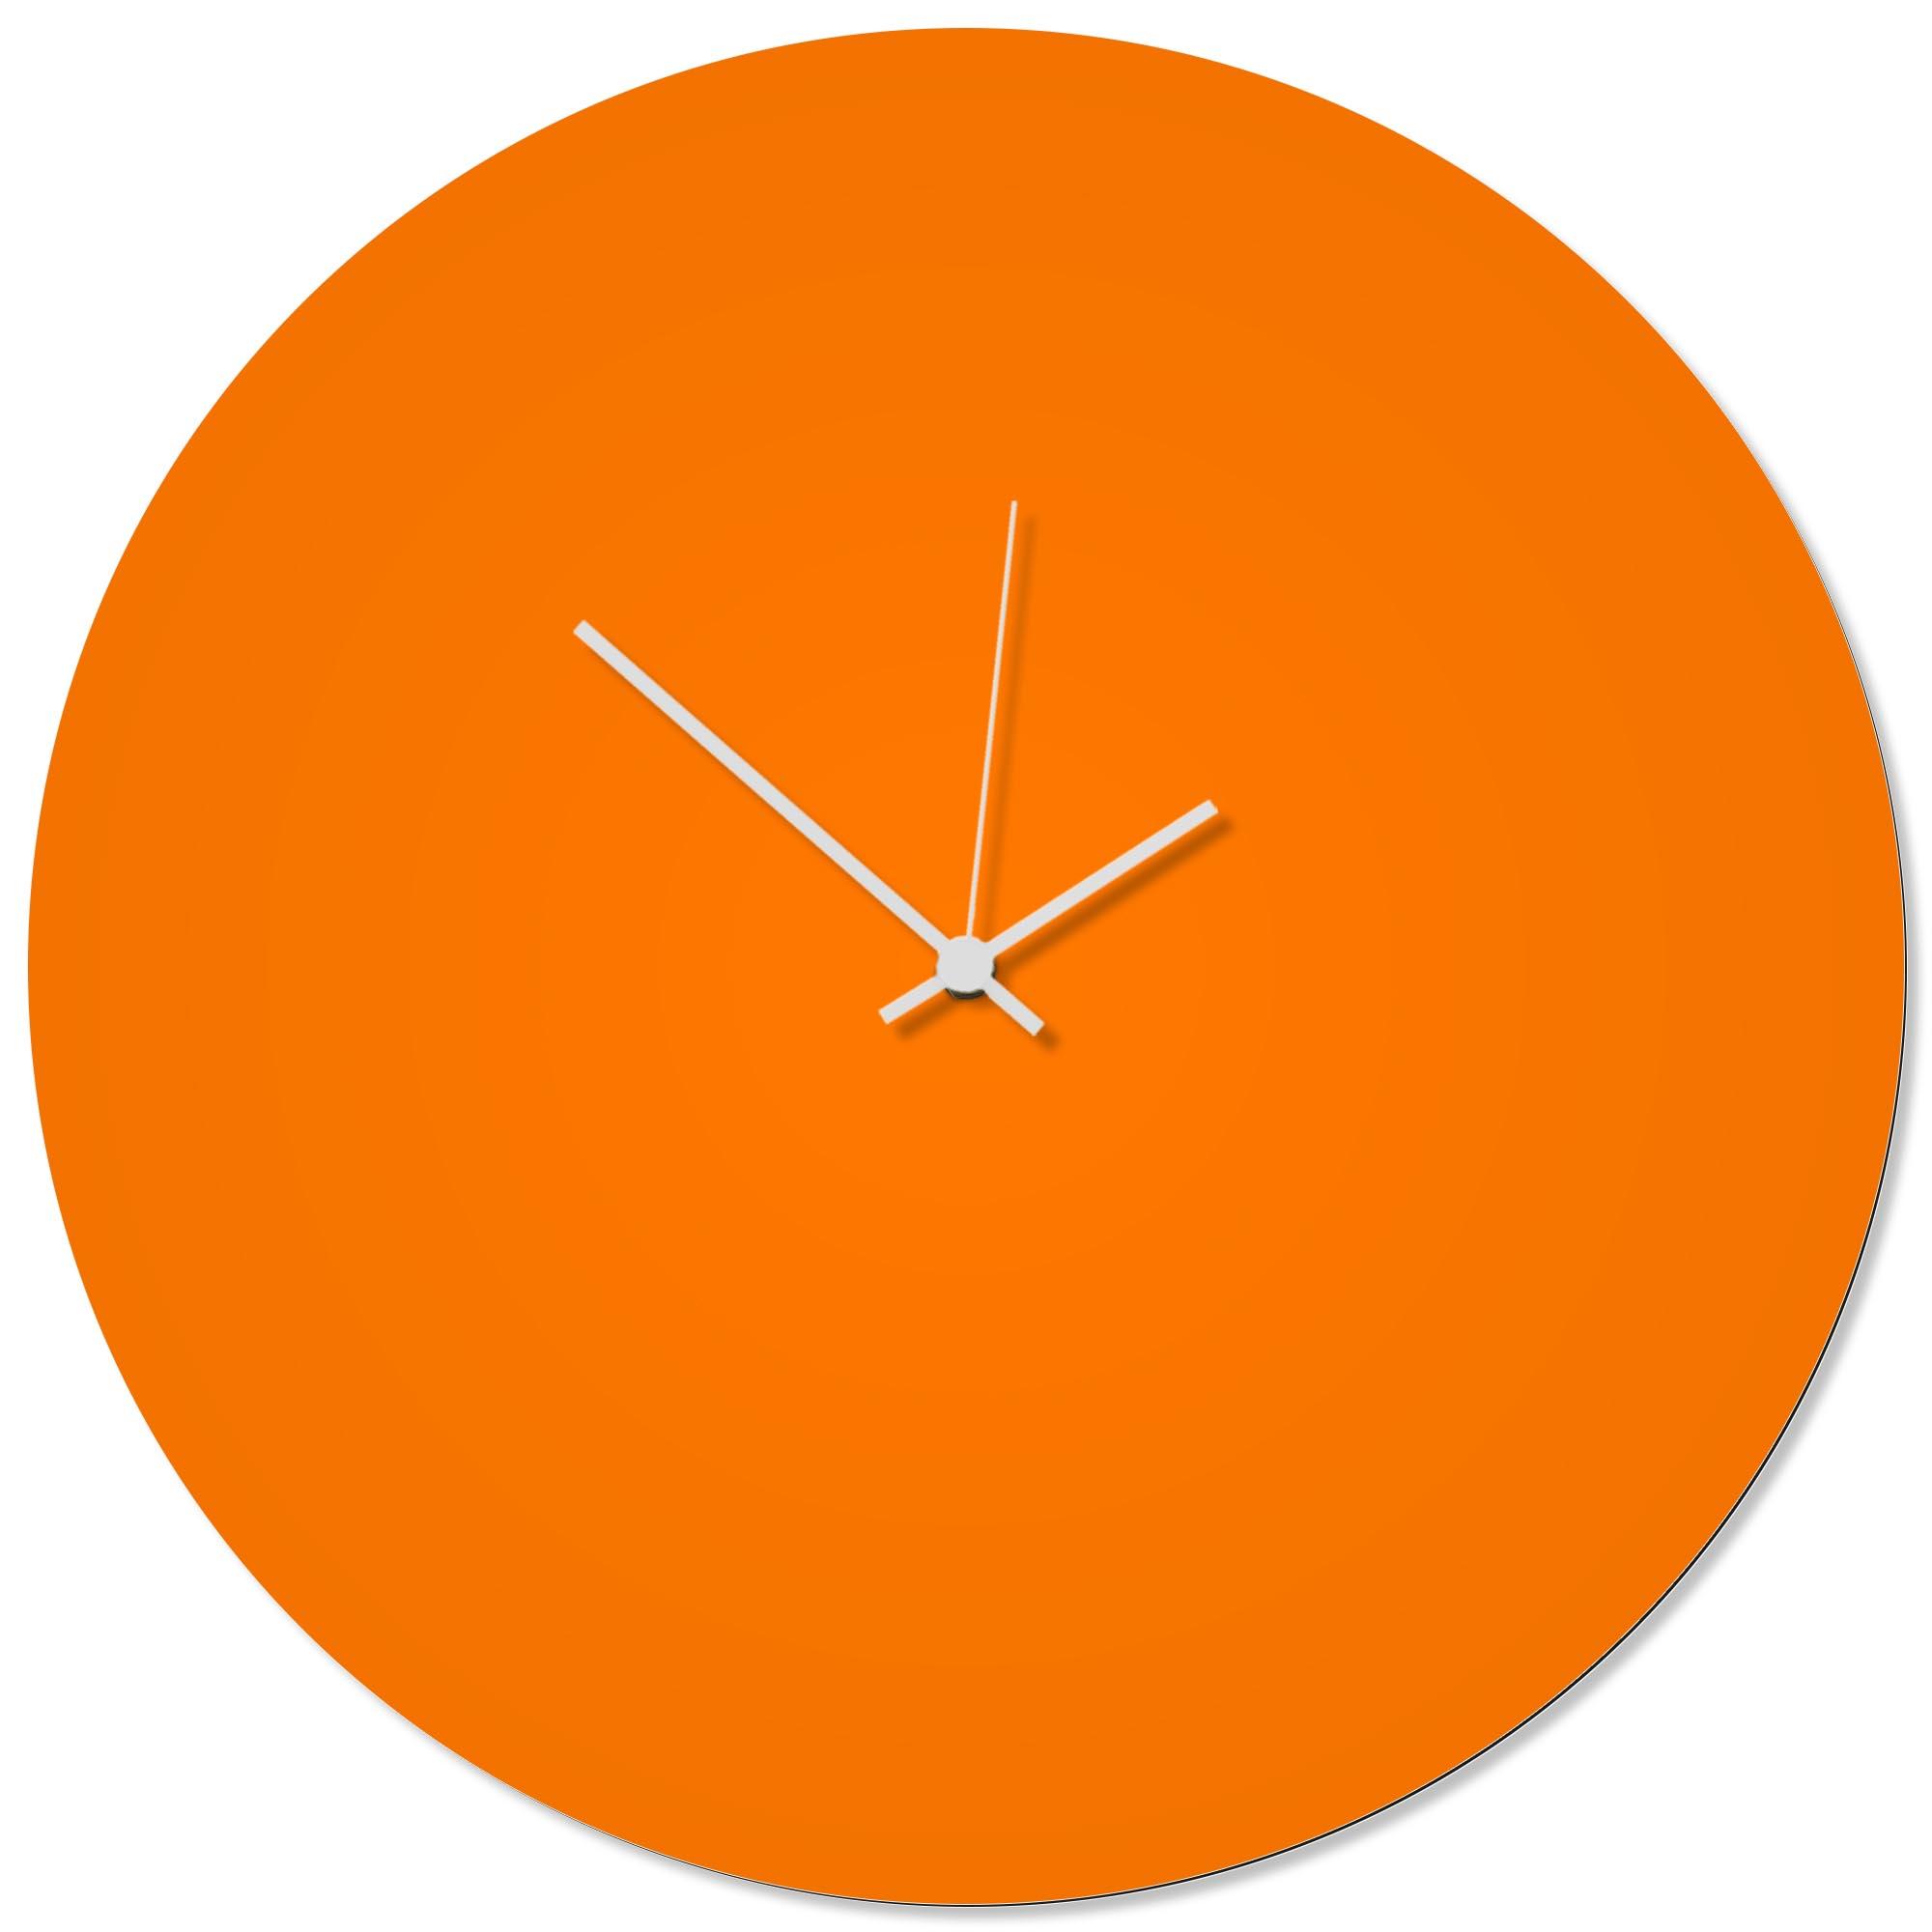 Orangeout White Circle Clock Large 23x23in. Aluminum Polymetal